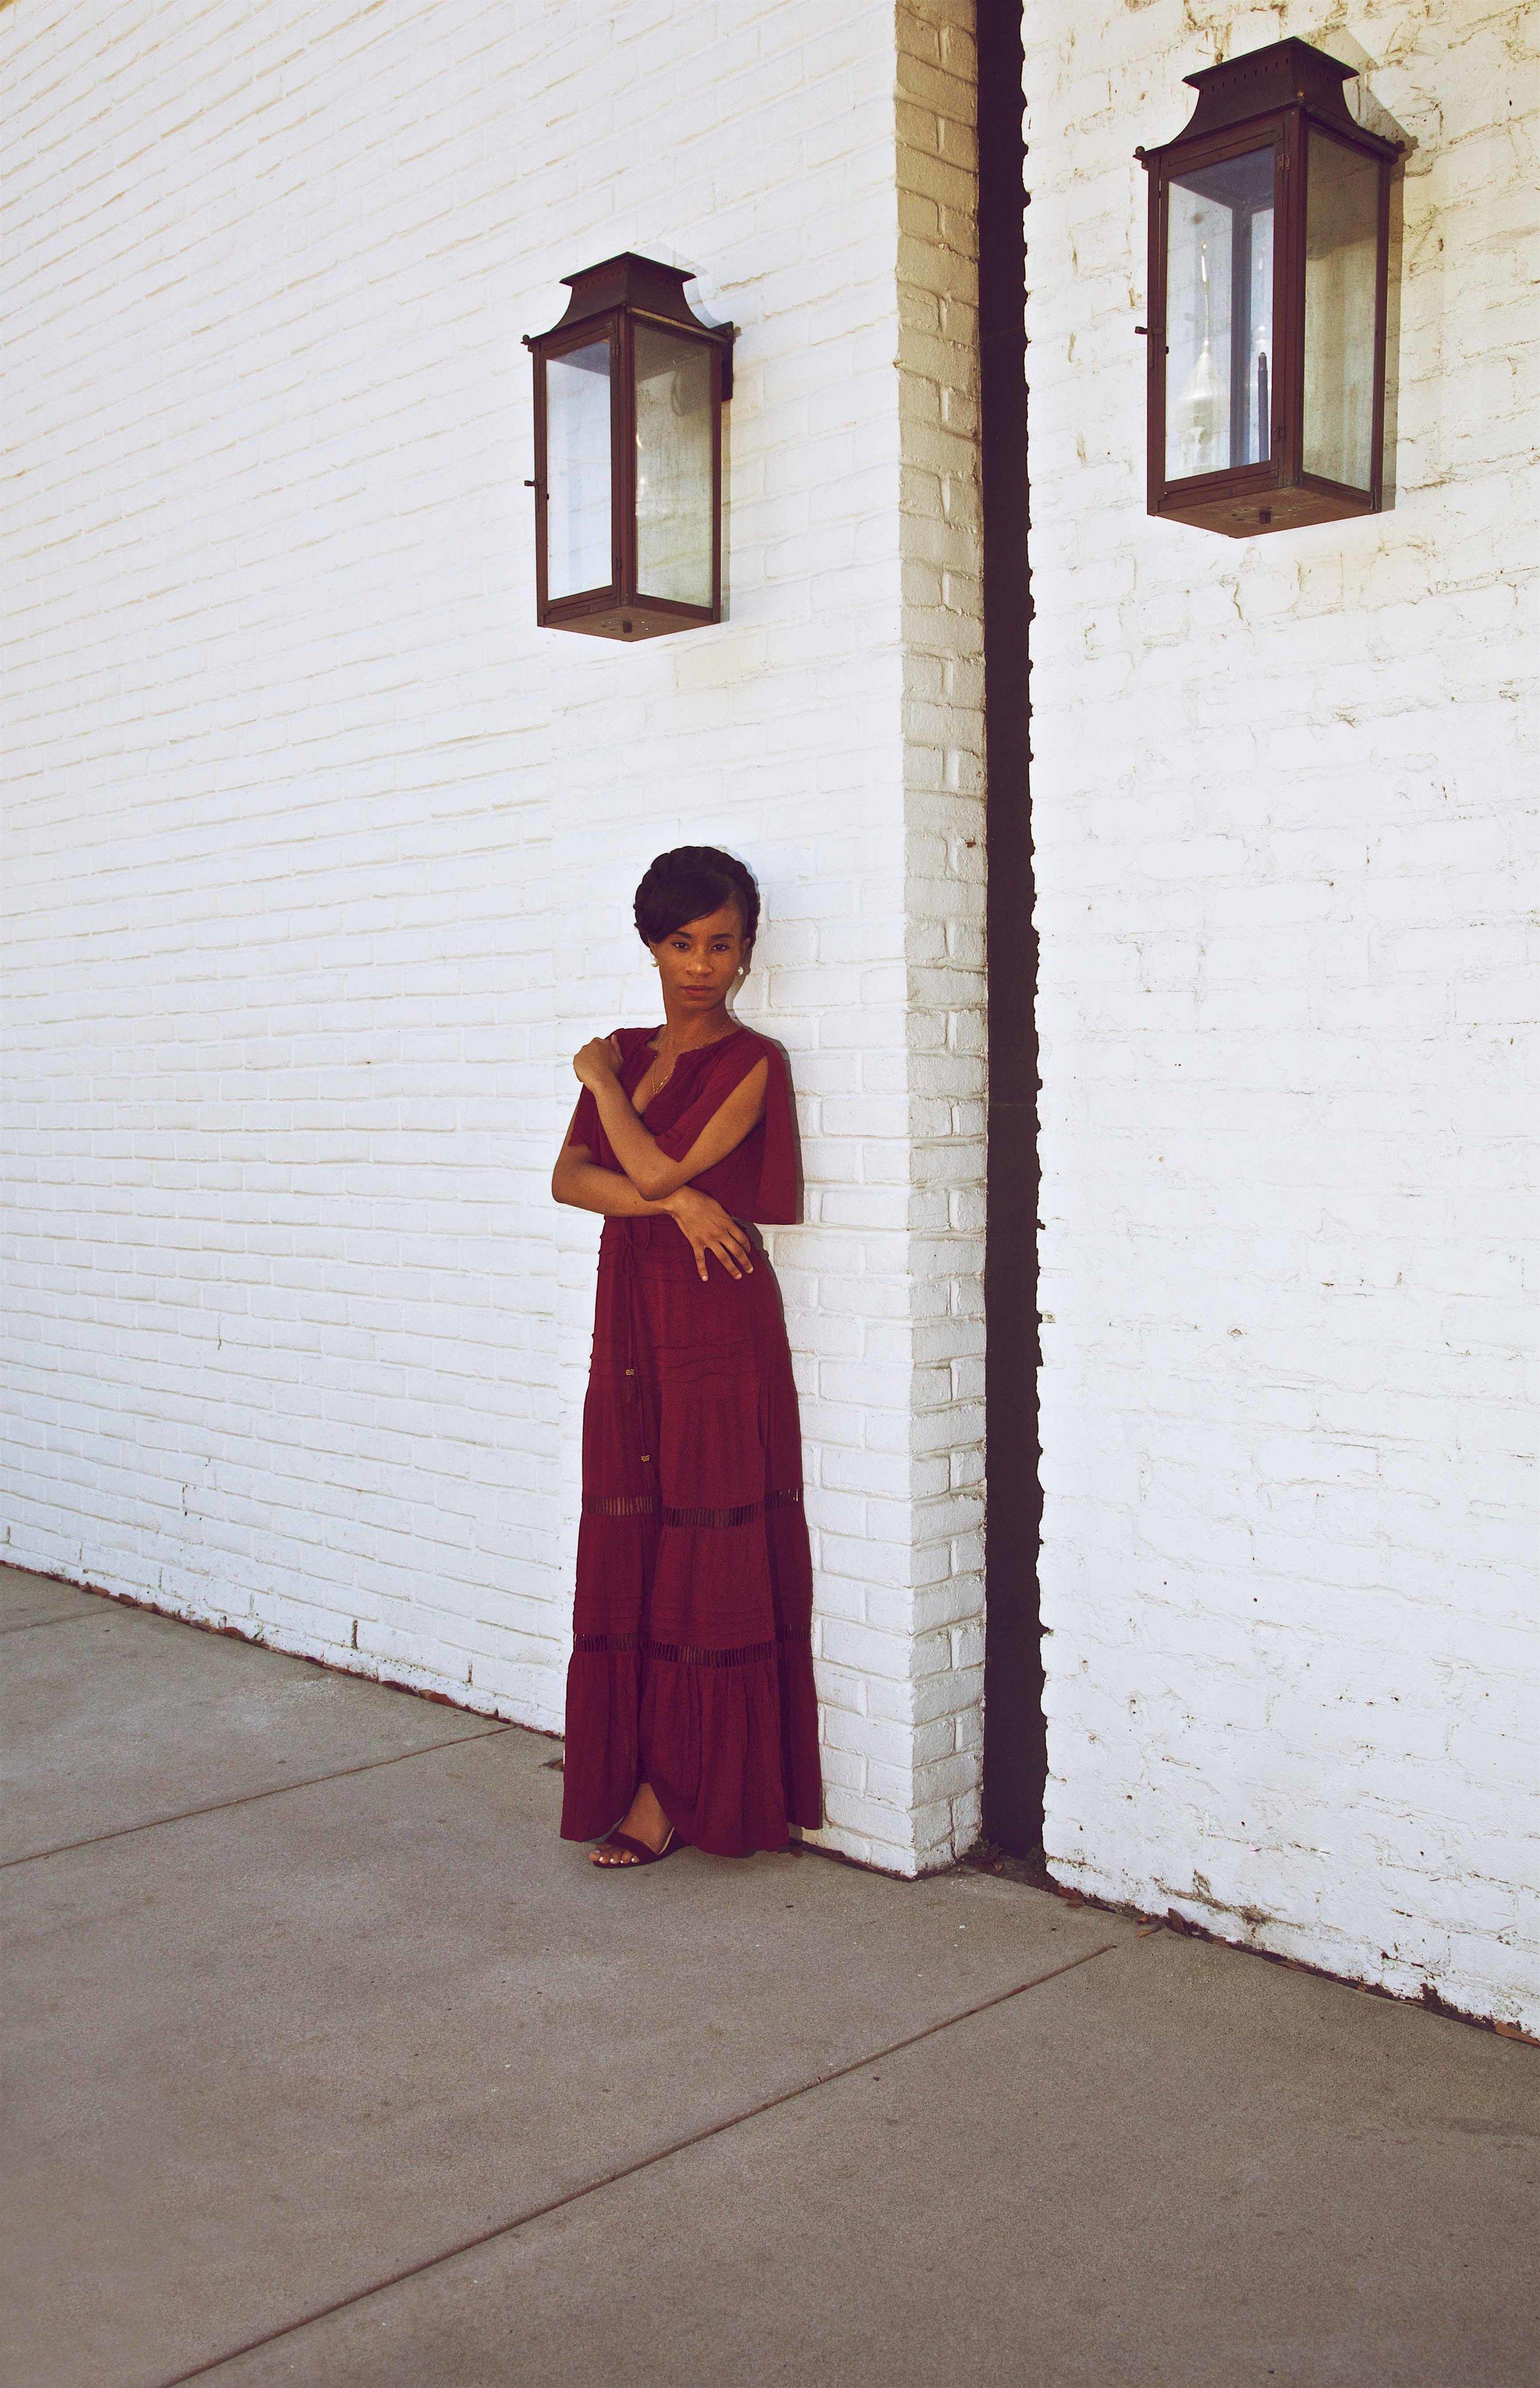 2018.3.3 Kayla Boronell by StanChambersJr Photography 2 small.jpg